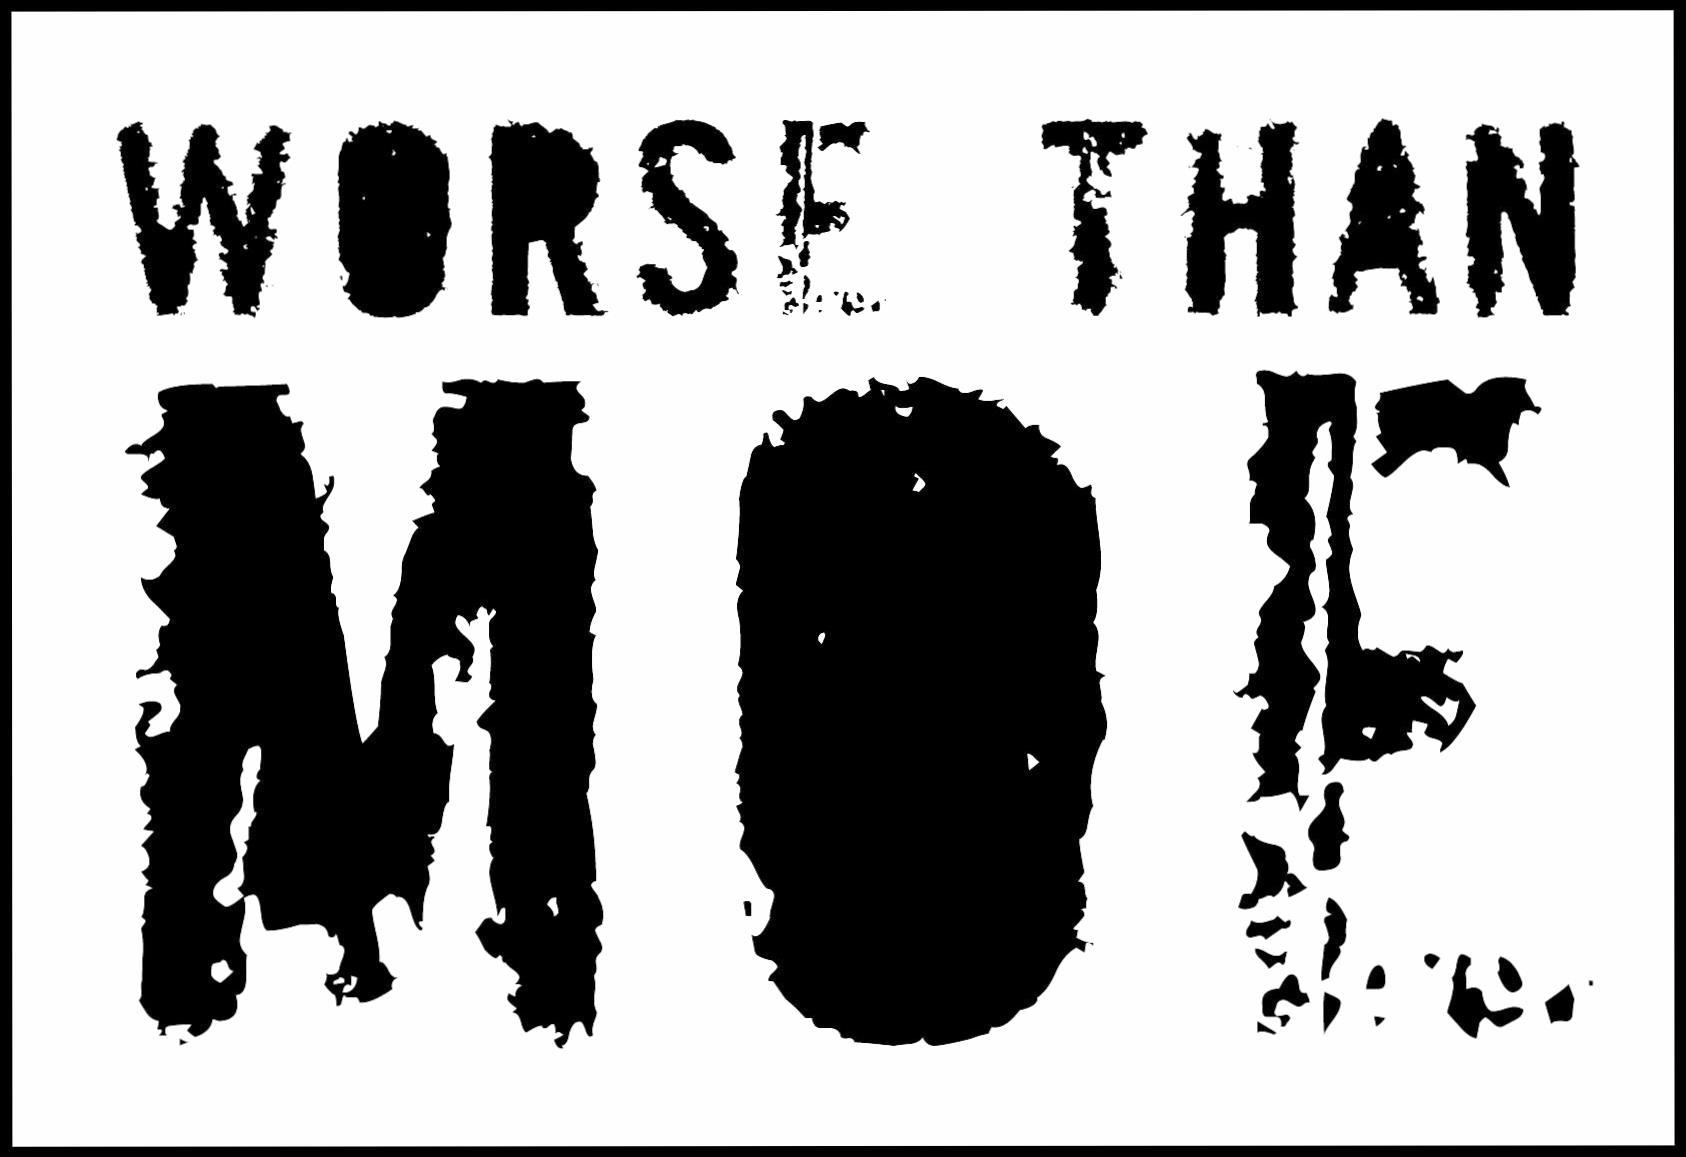 Less Than Moe